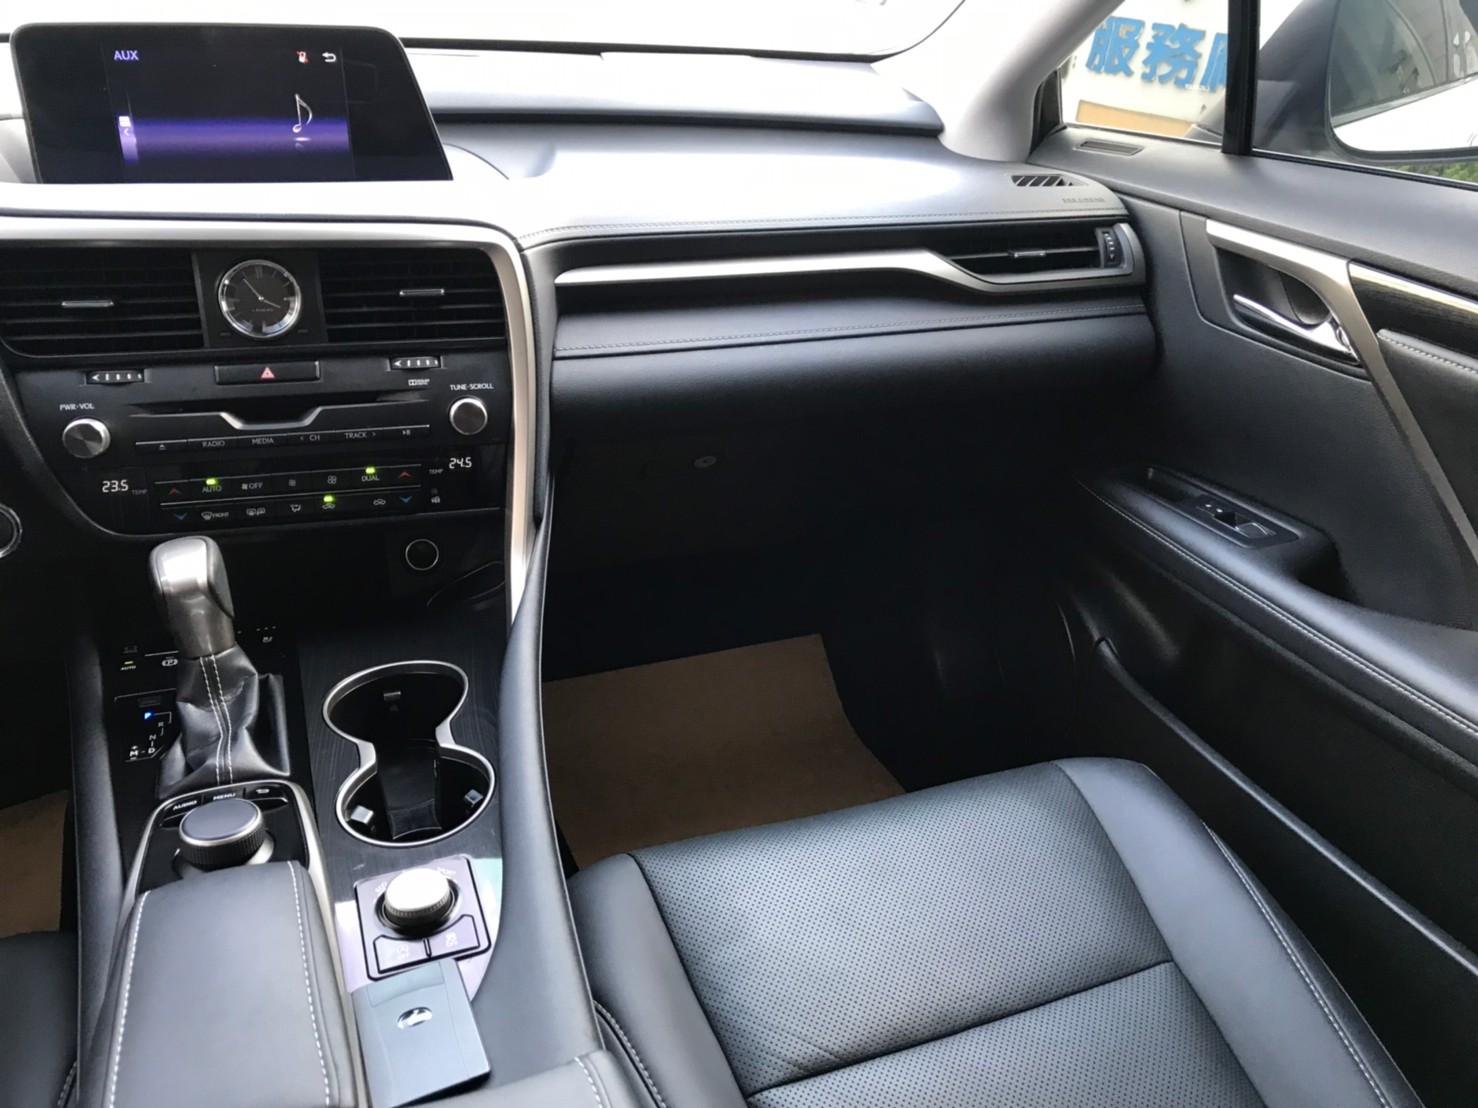 2018RX300白SUM151.8 2.0cc 主動跟車 AEB自動緊急煞車 車道偏離 盲點補助_210620_5